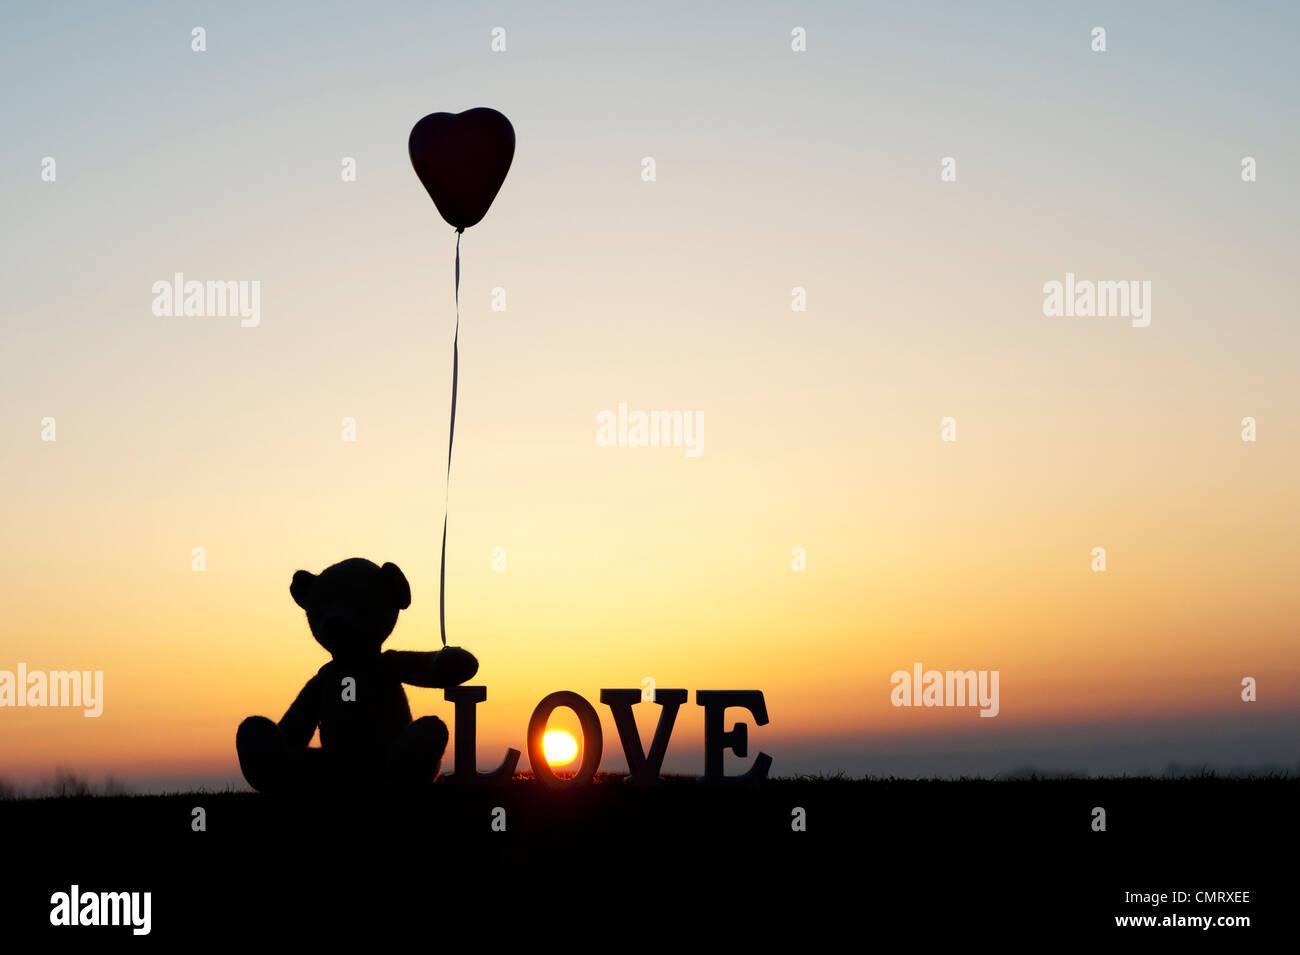 Teddy Bär hält ein Herzballon Form als nächstes auch das Wort Liebe bei Sonnenaufgang Stockbild